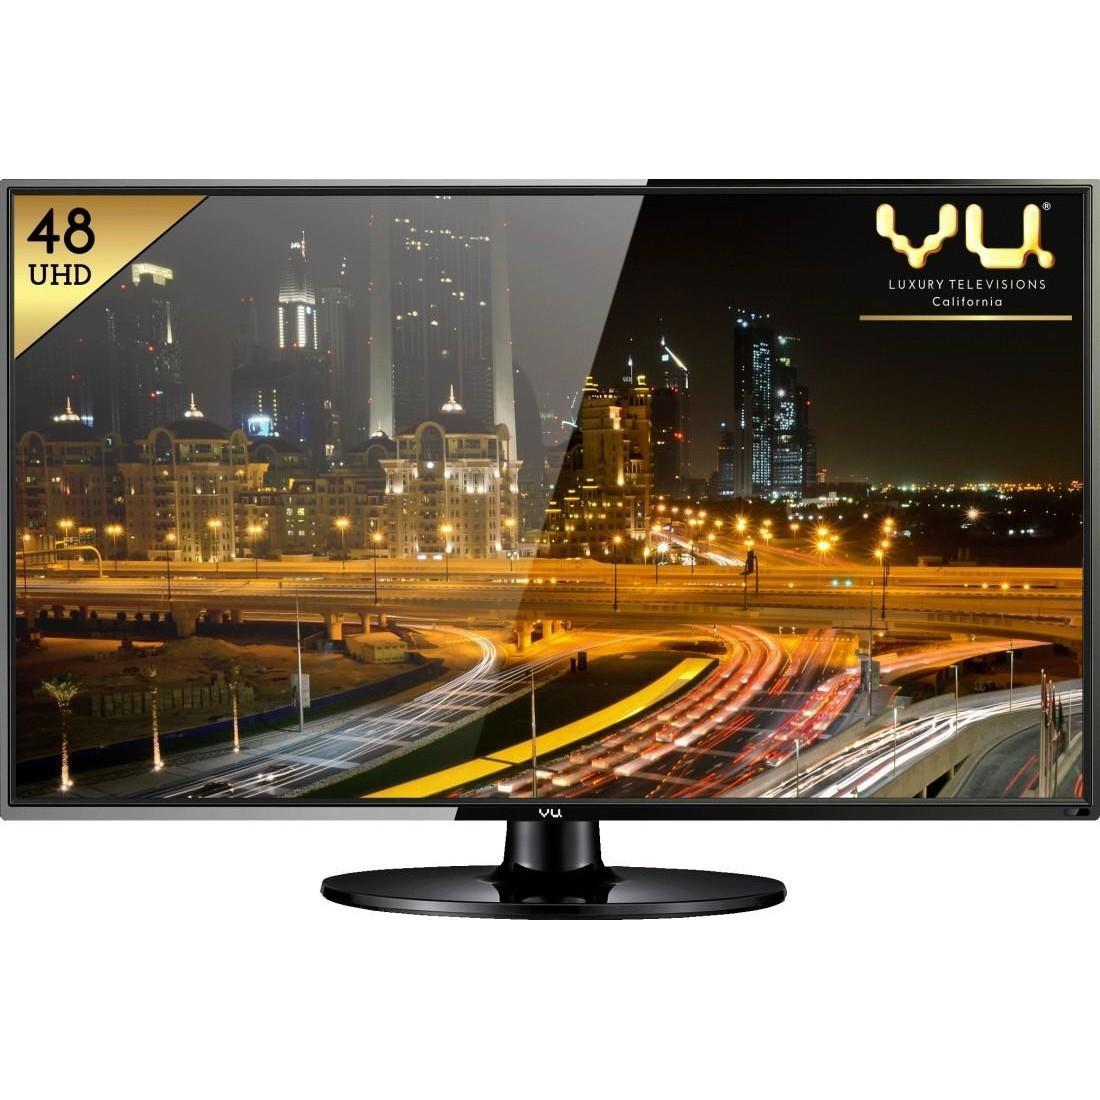 Vu 48D6455 122 cm (48) LED TV (Ultra HD (4K), Smart) Image